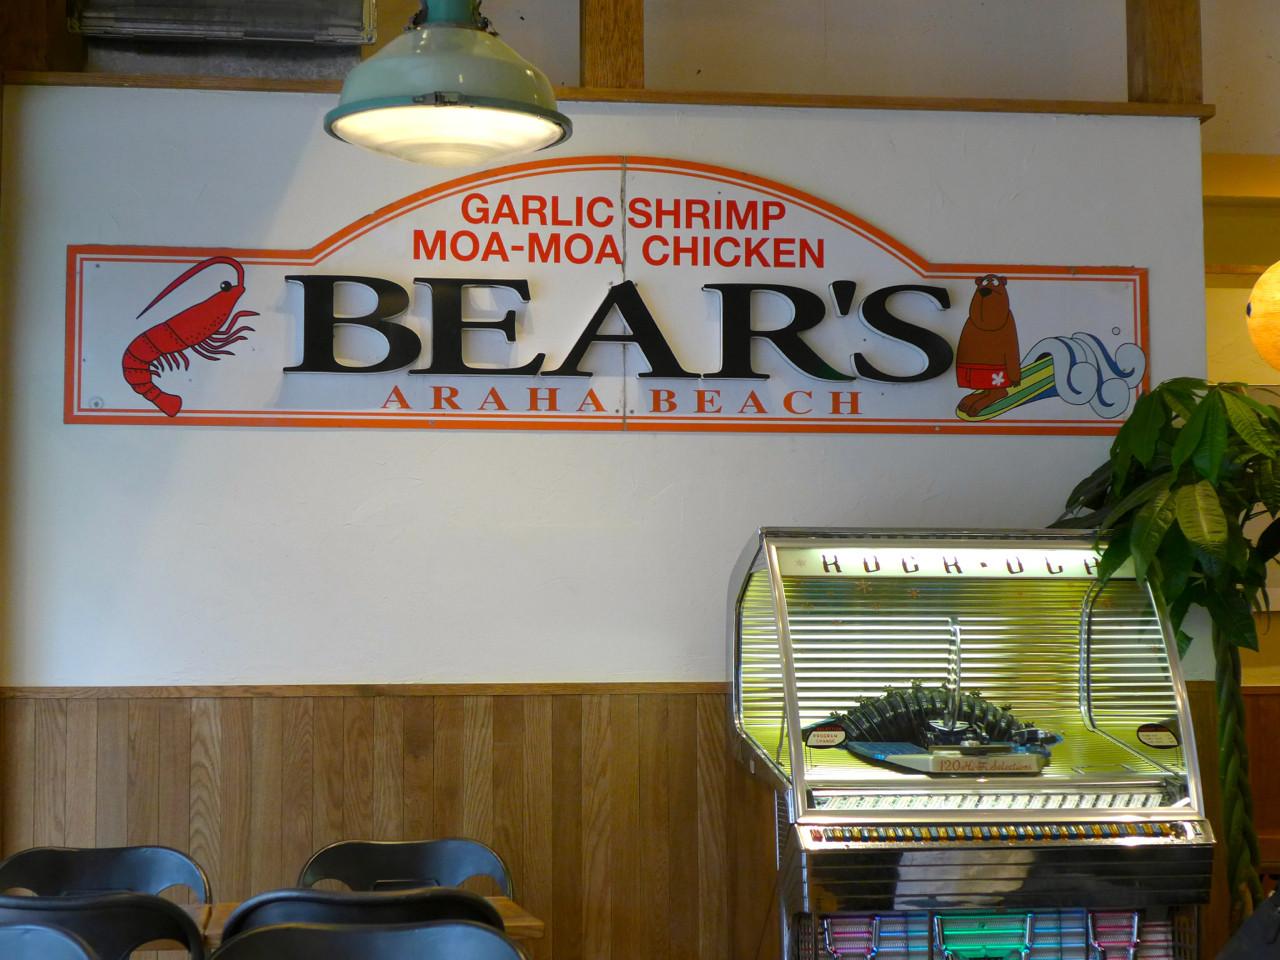 The Barba Tokyo Dine & Bear's